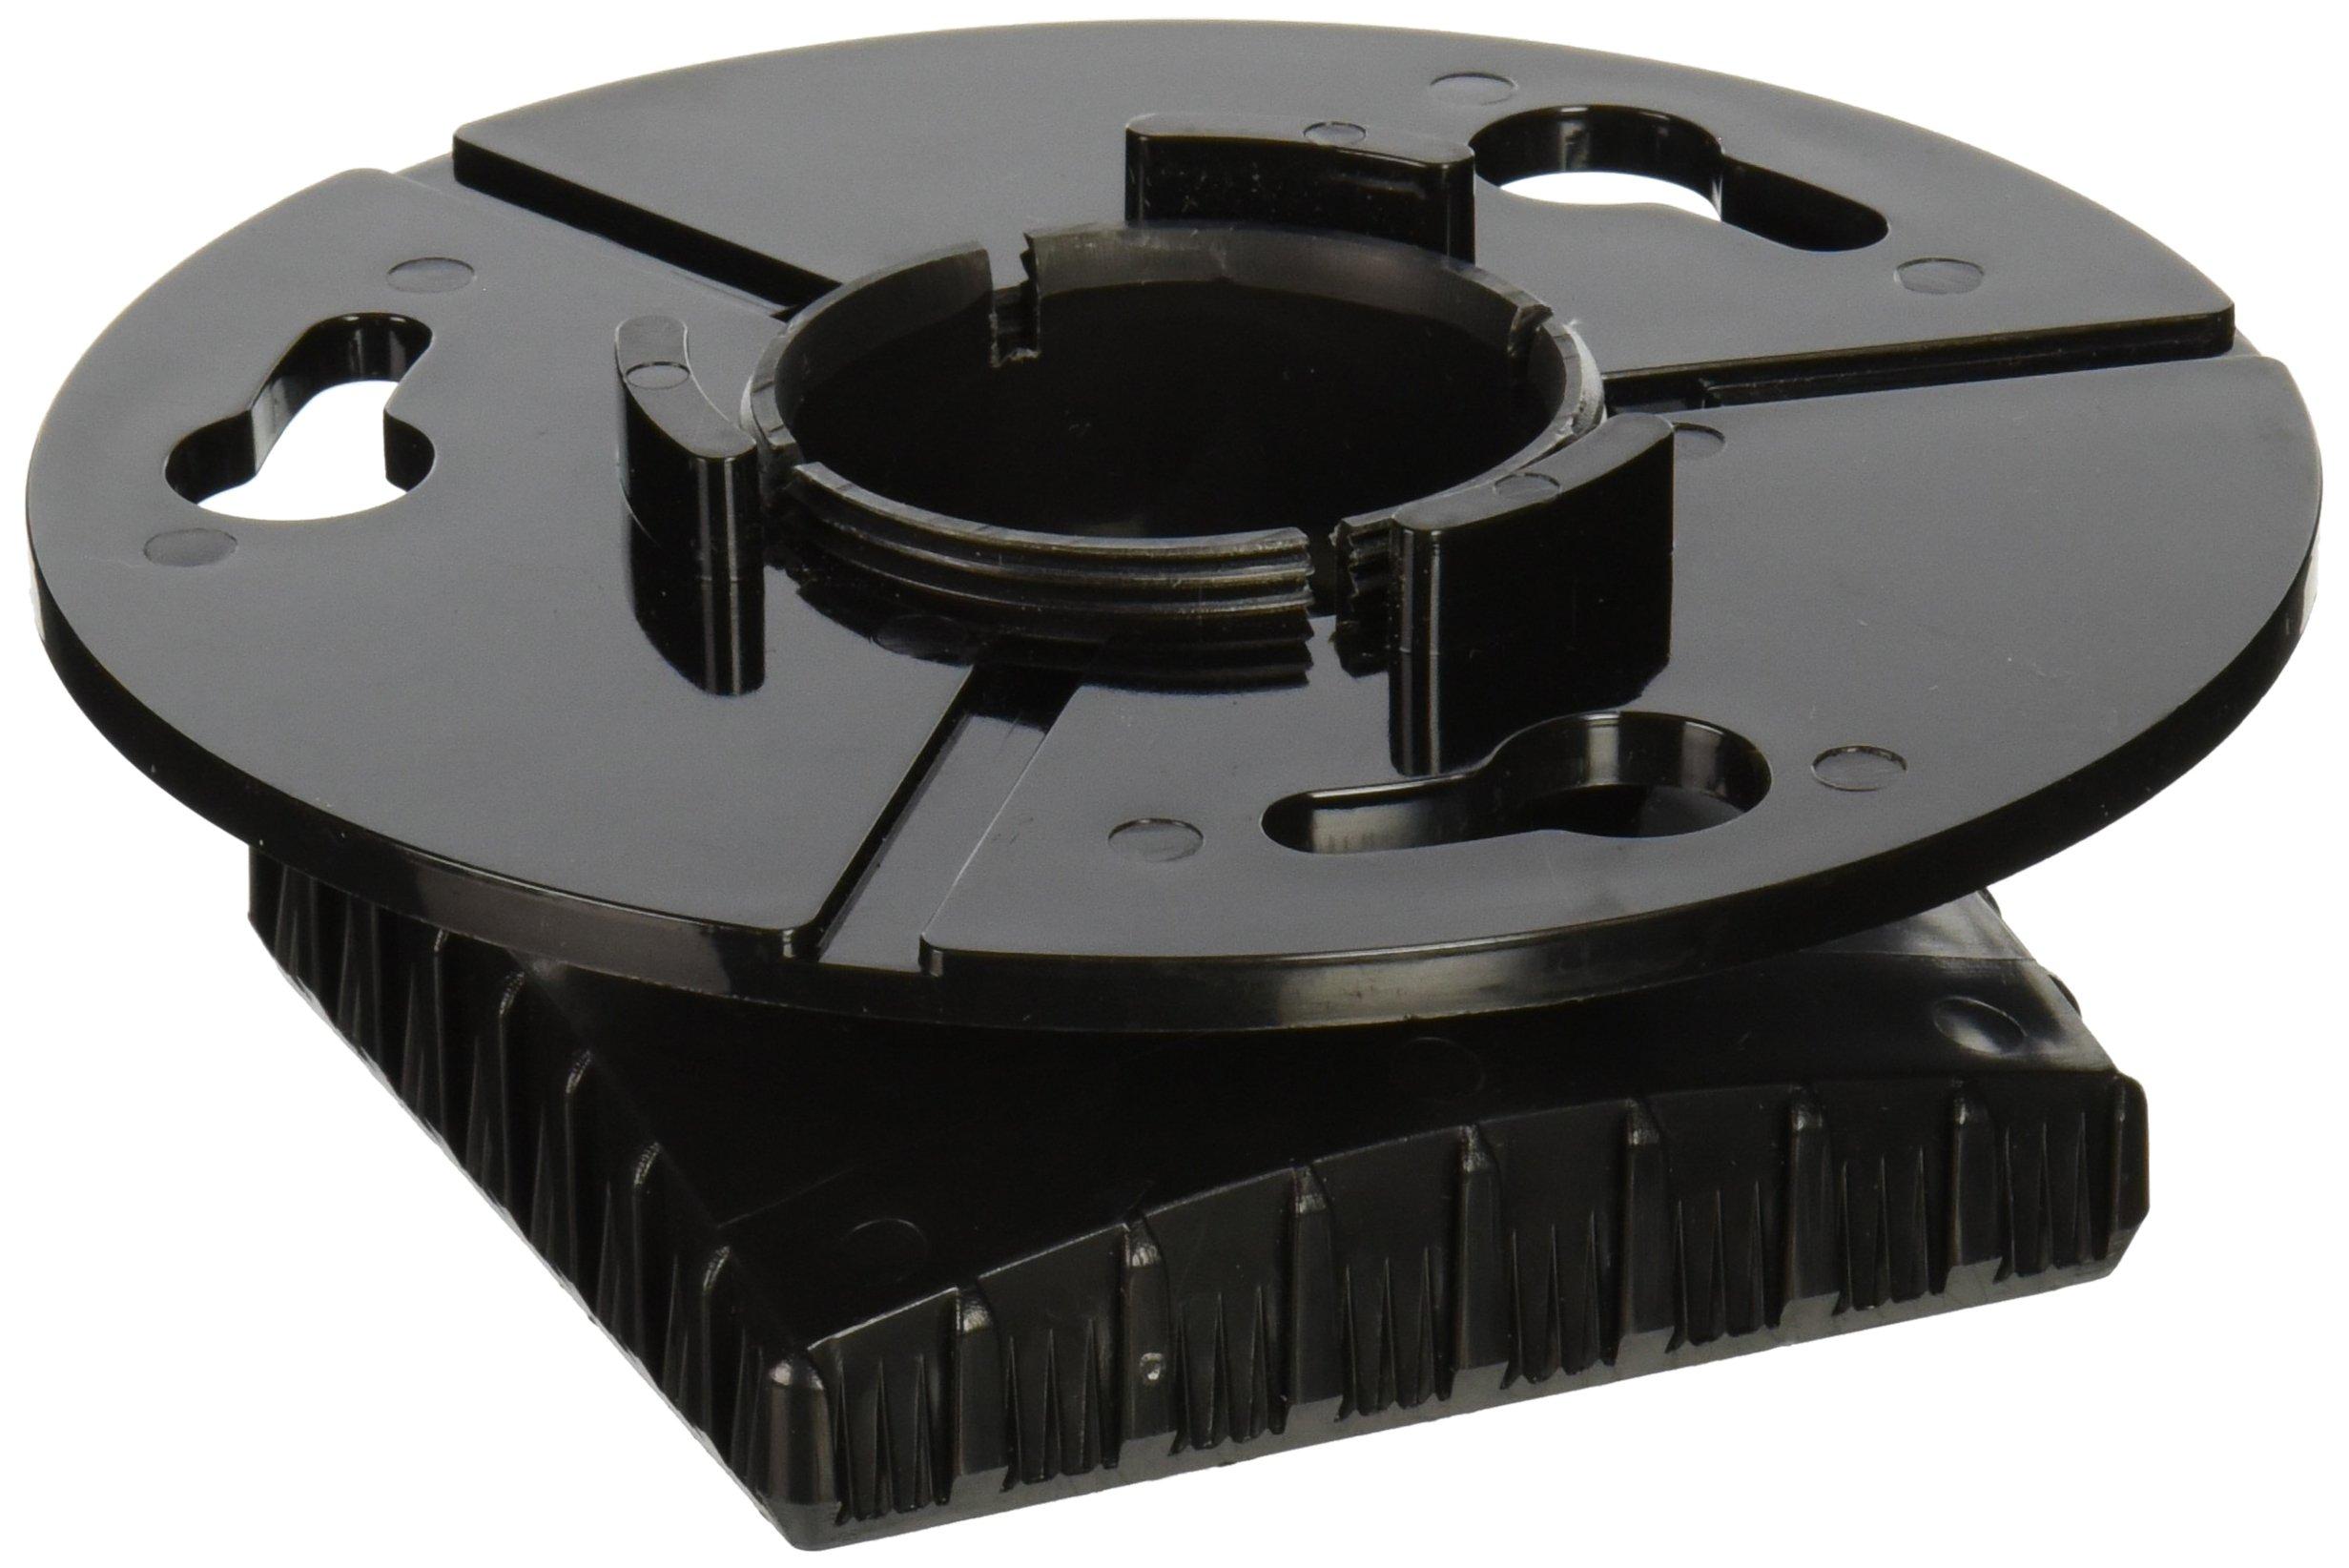 Ebbe E209 Drain Adapter Kit